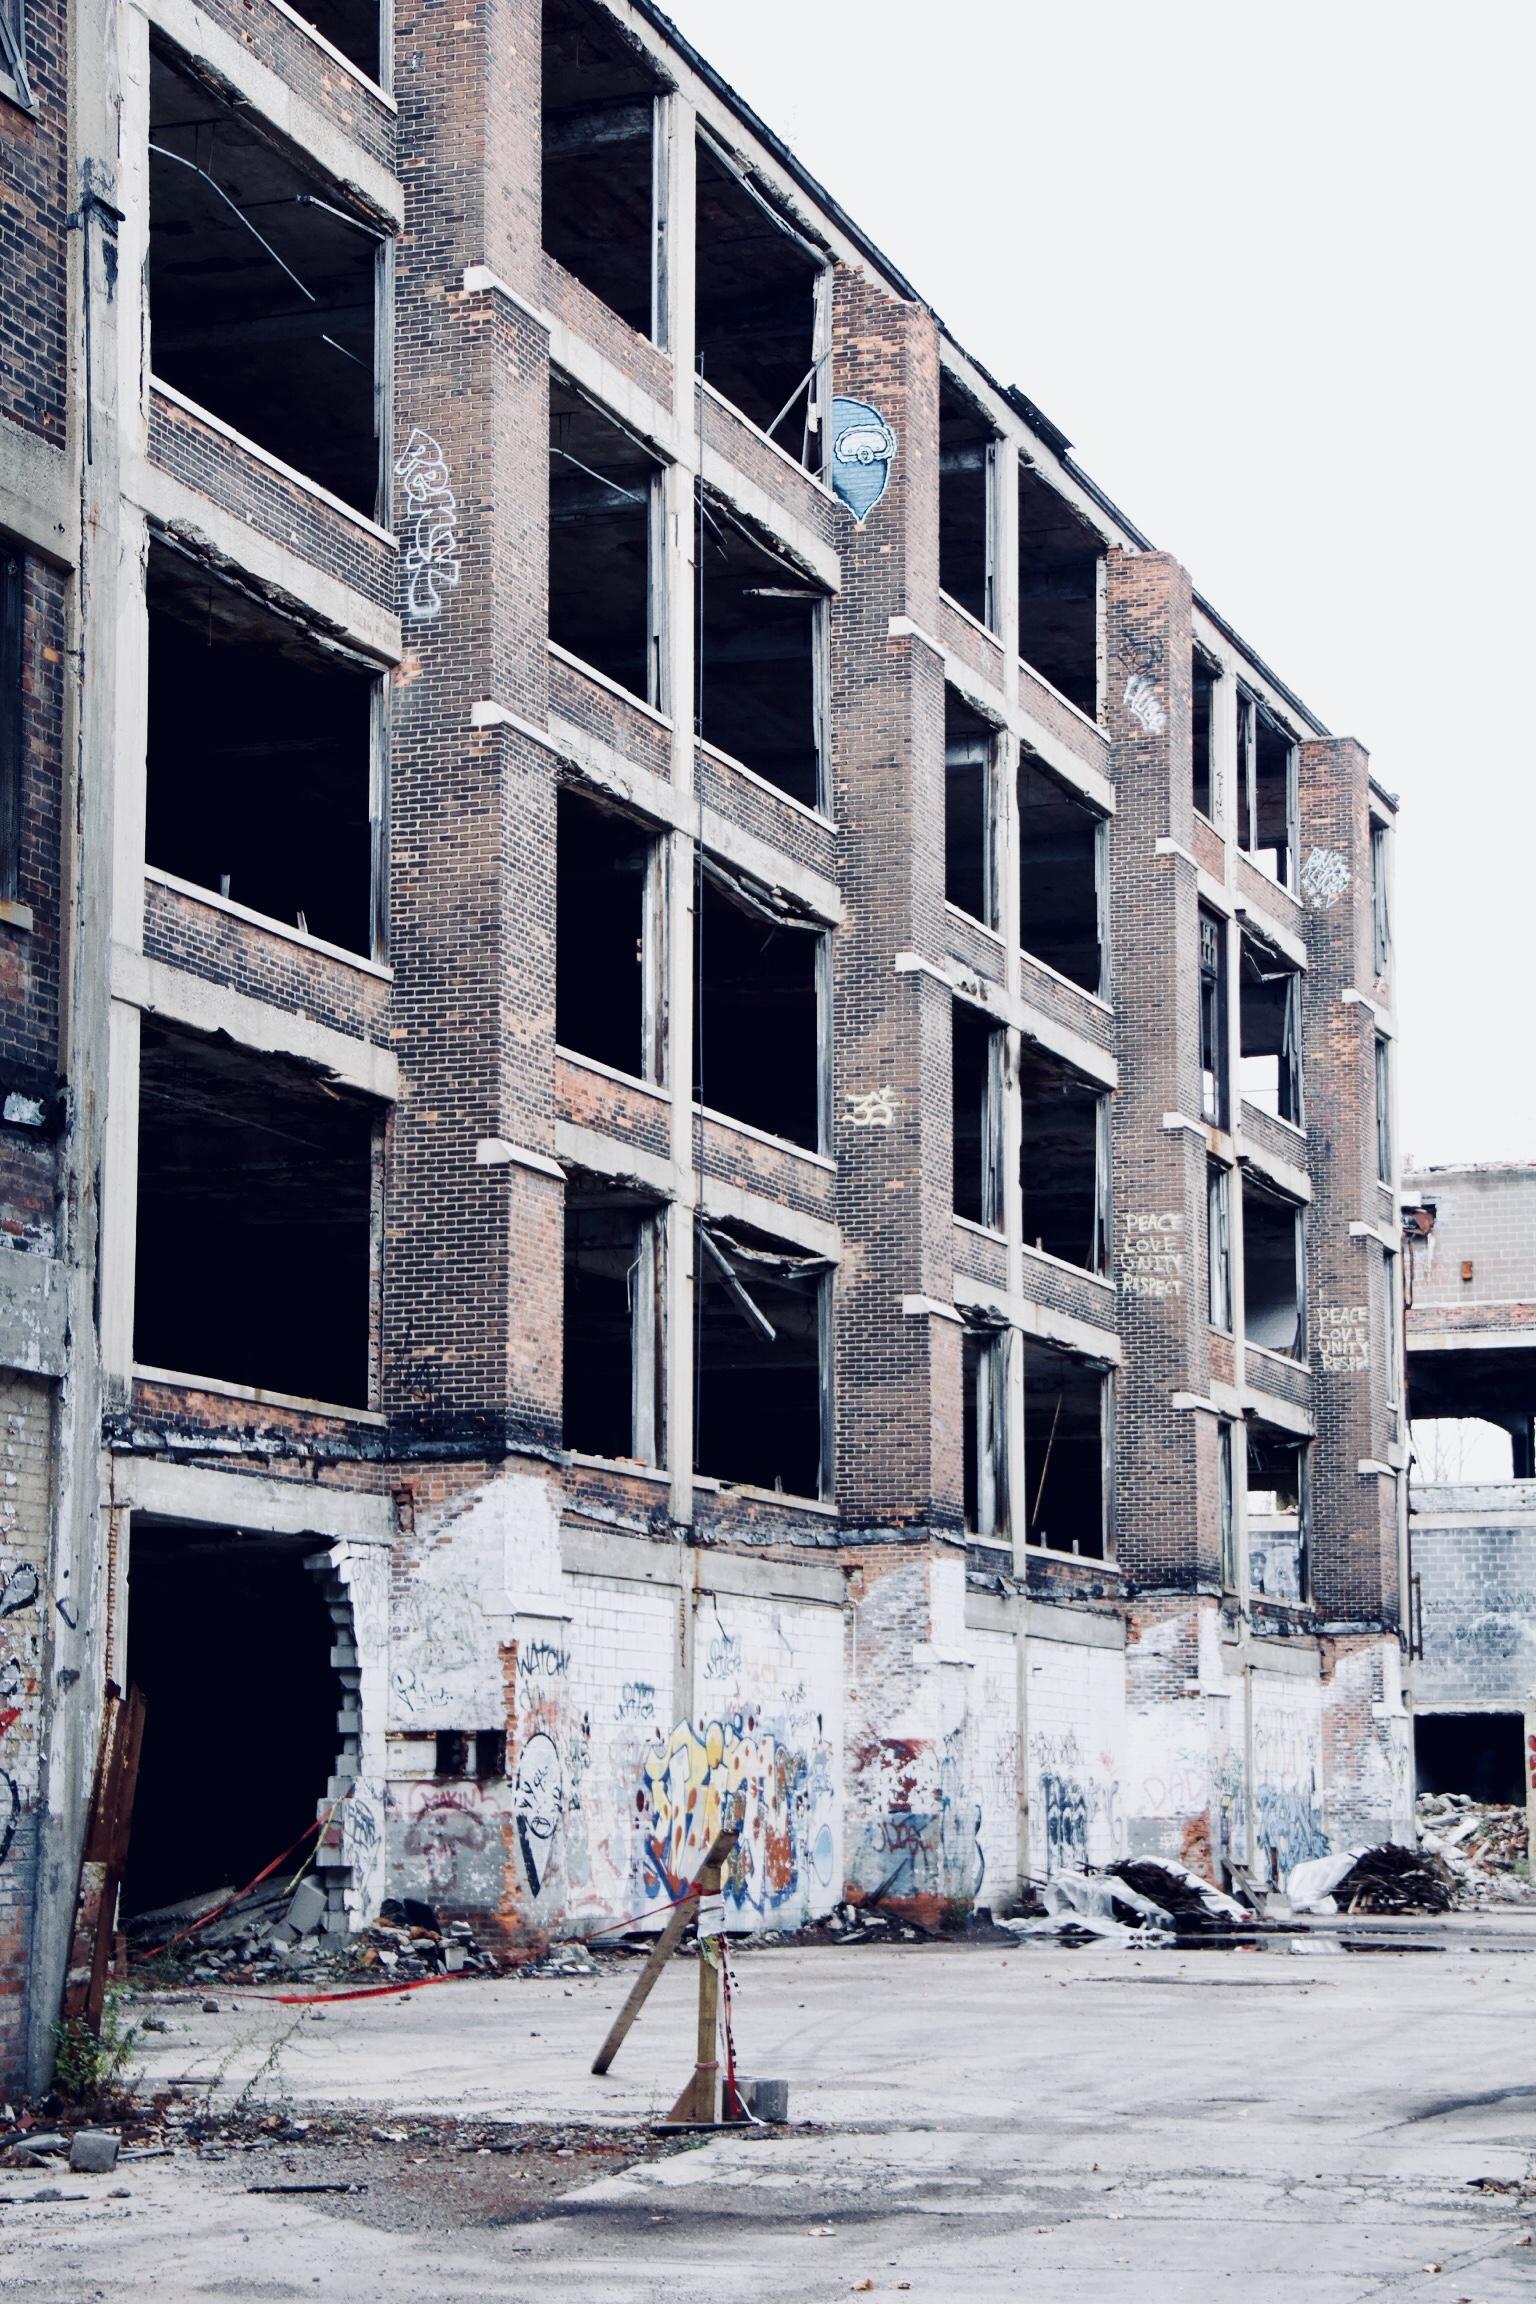 facade serie 4 - Les aventuriers de l'usine perdue